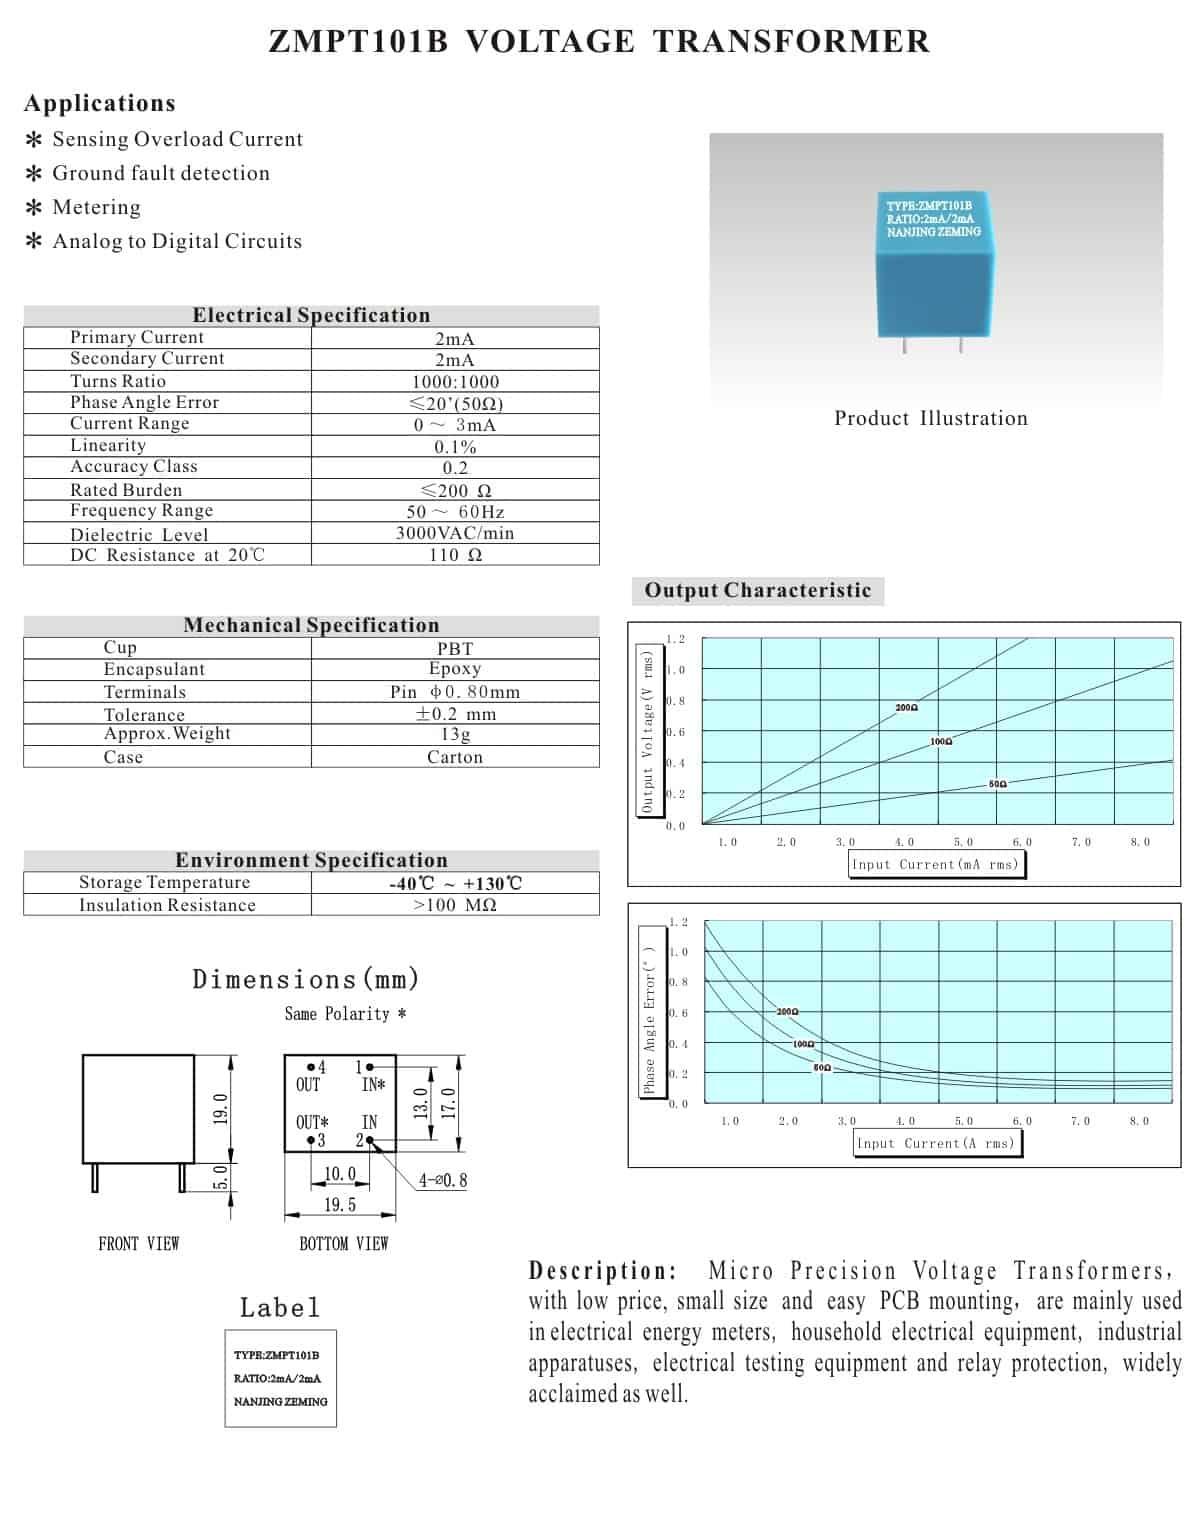 ZMPT101B-Datasheet